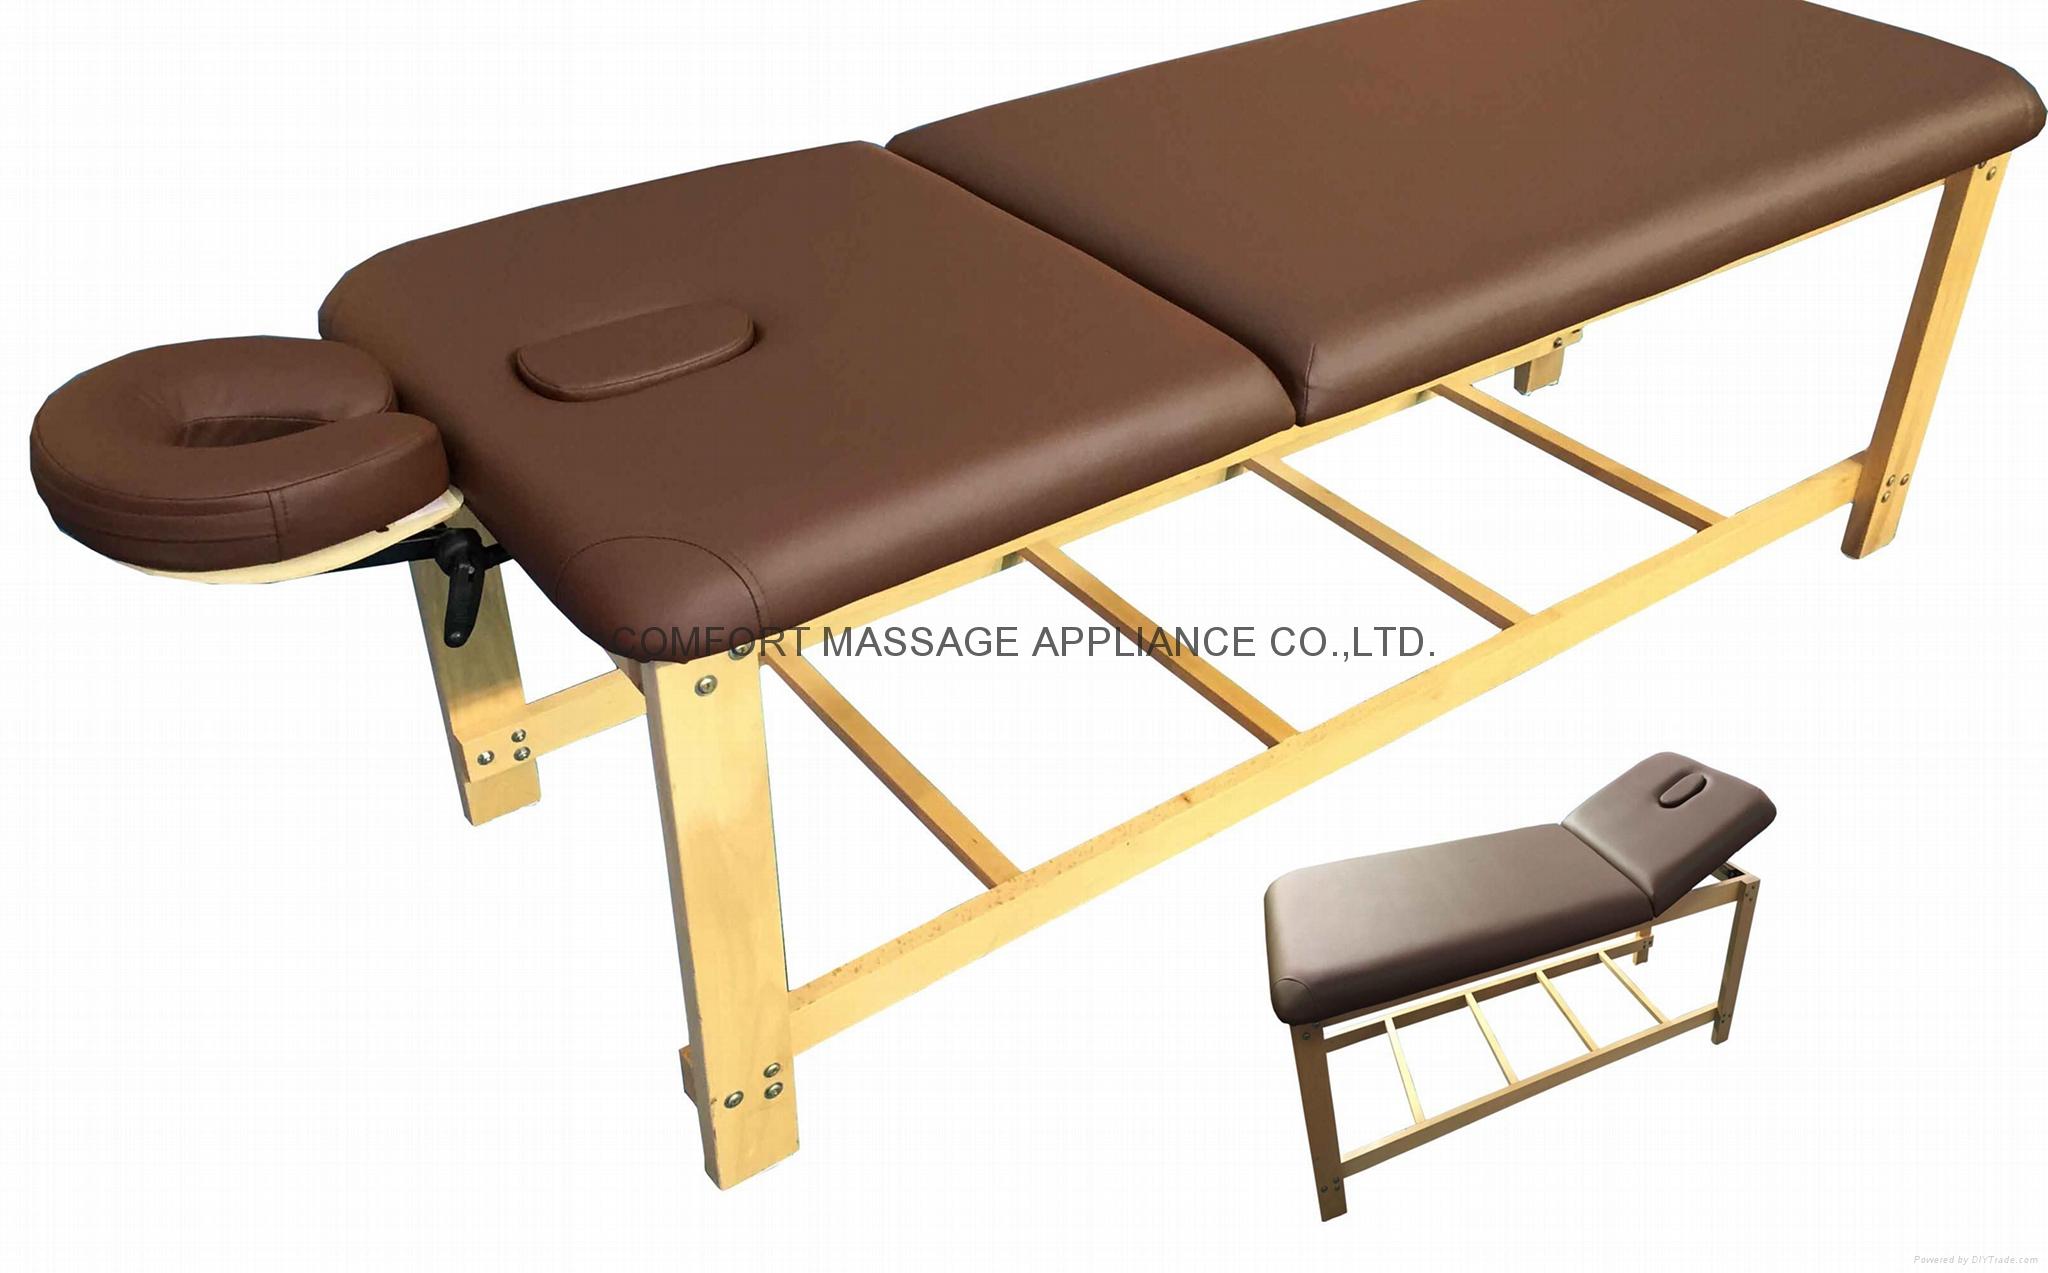 SM-007 disassembled stationary massage table with adjustable backrest 1